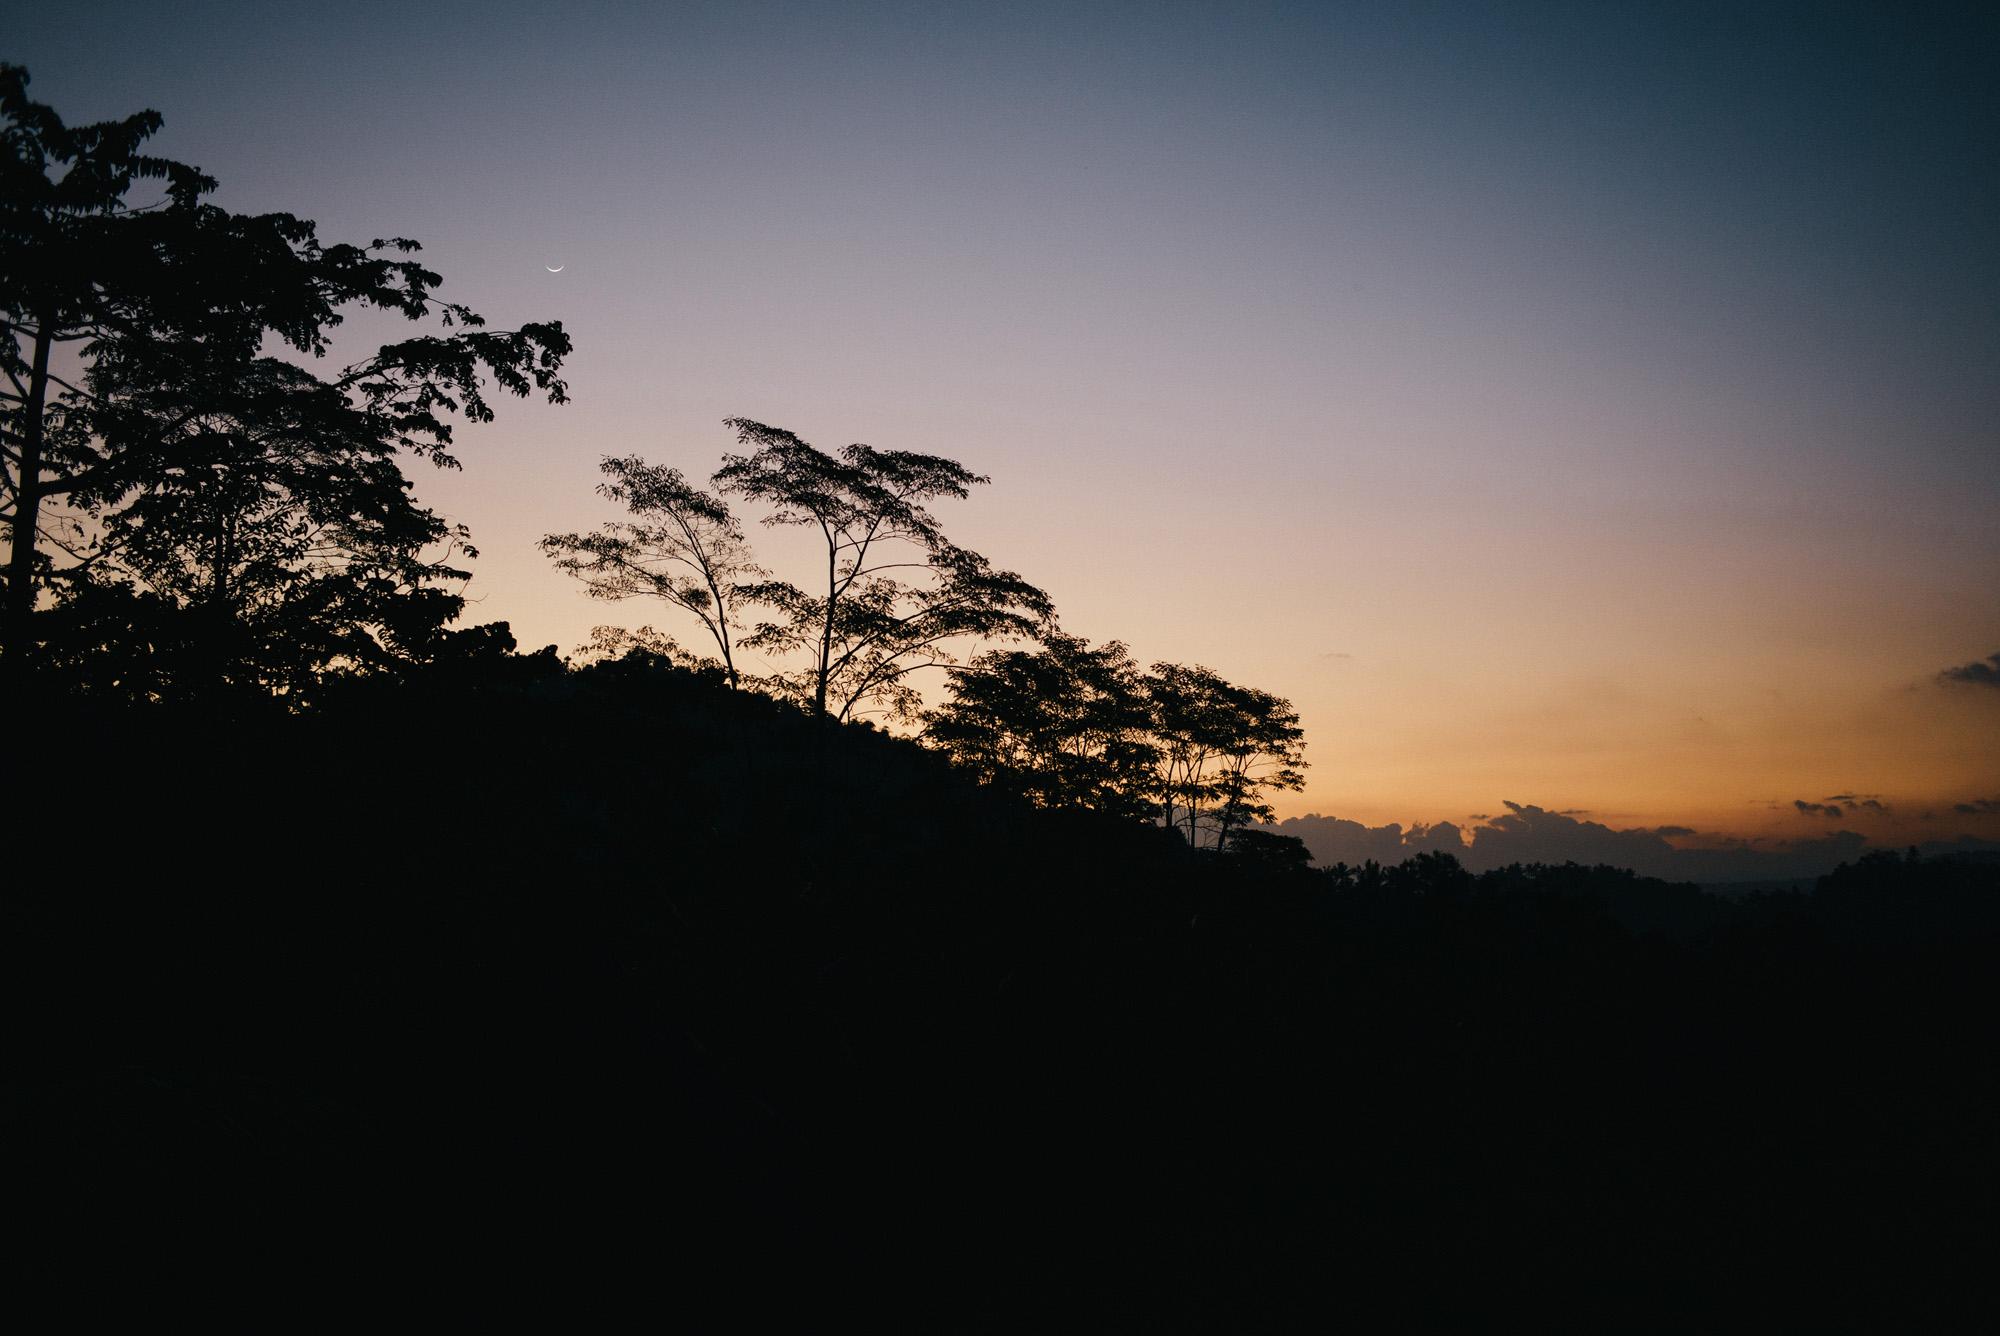 Crescent Moon over Sidemen, Bali